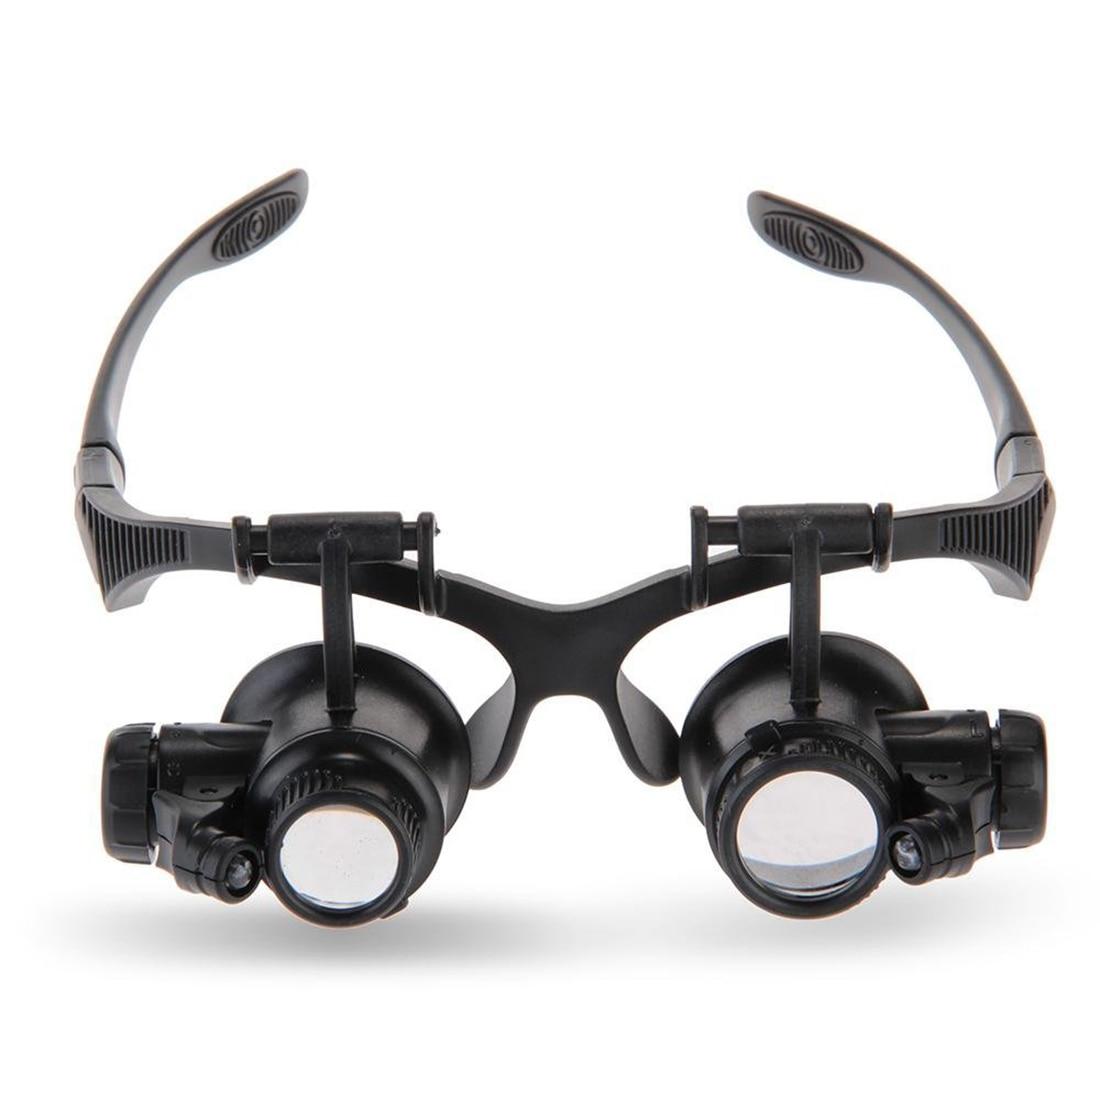 Magnifying Glasses 10X 15X 20X 25X Eye Jewelry Watch Repair Magnifier Glasses With 2 LED Lights Microscope окуляр для зрительных труб nikon prostaff 5 20x 25x